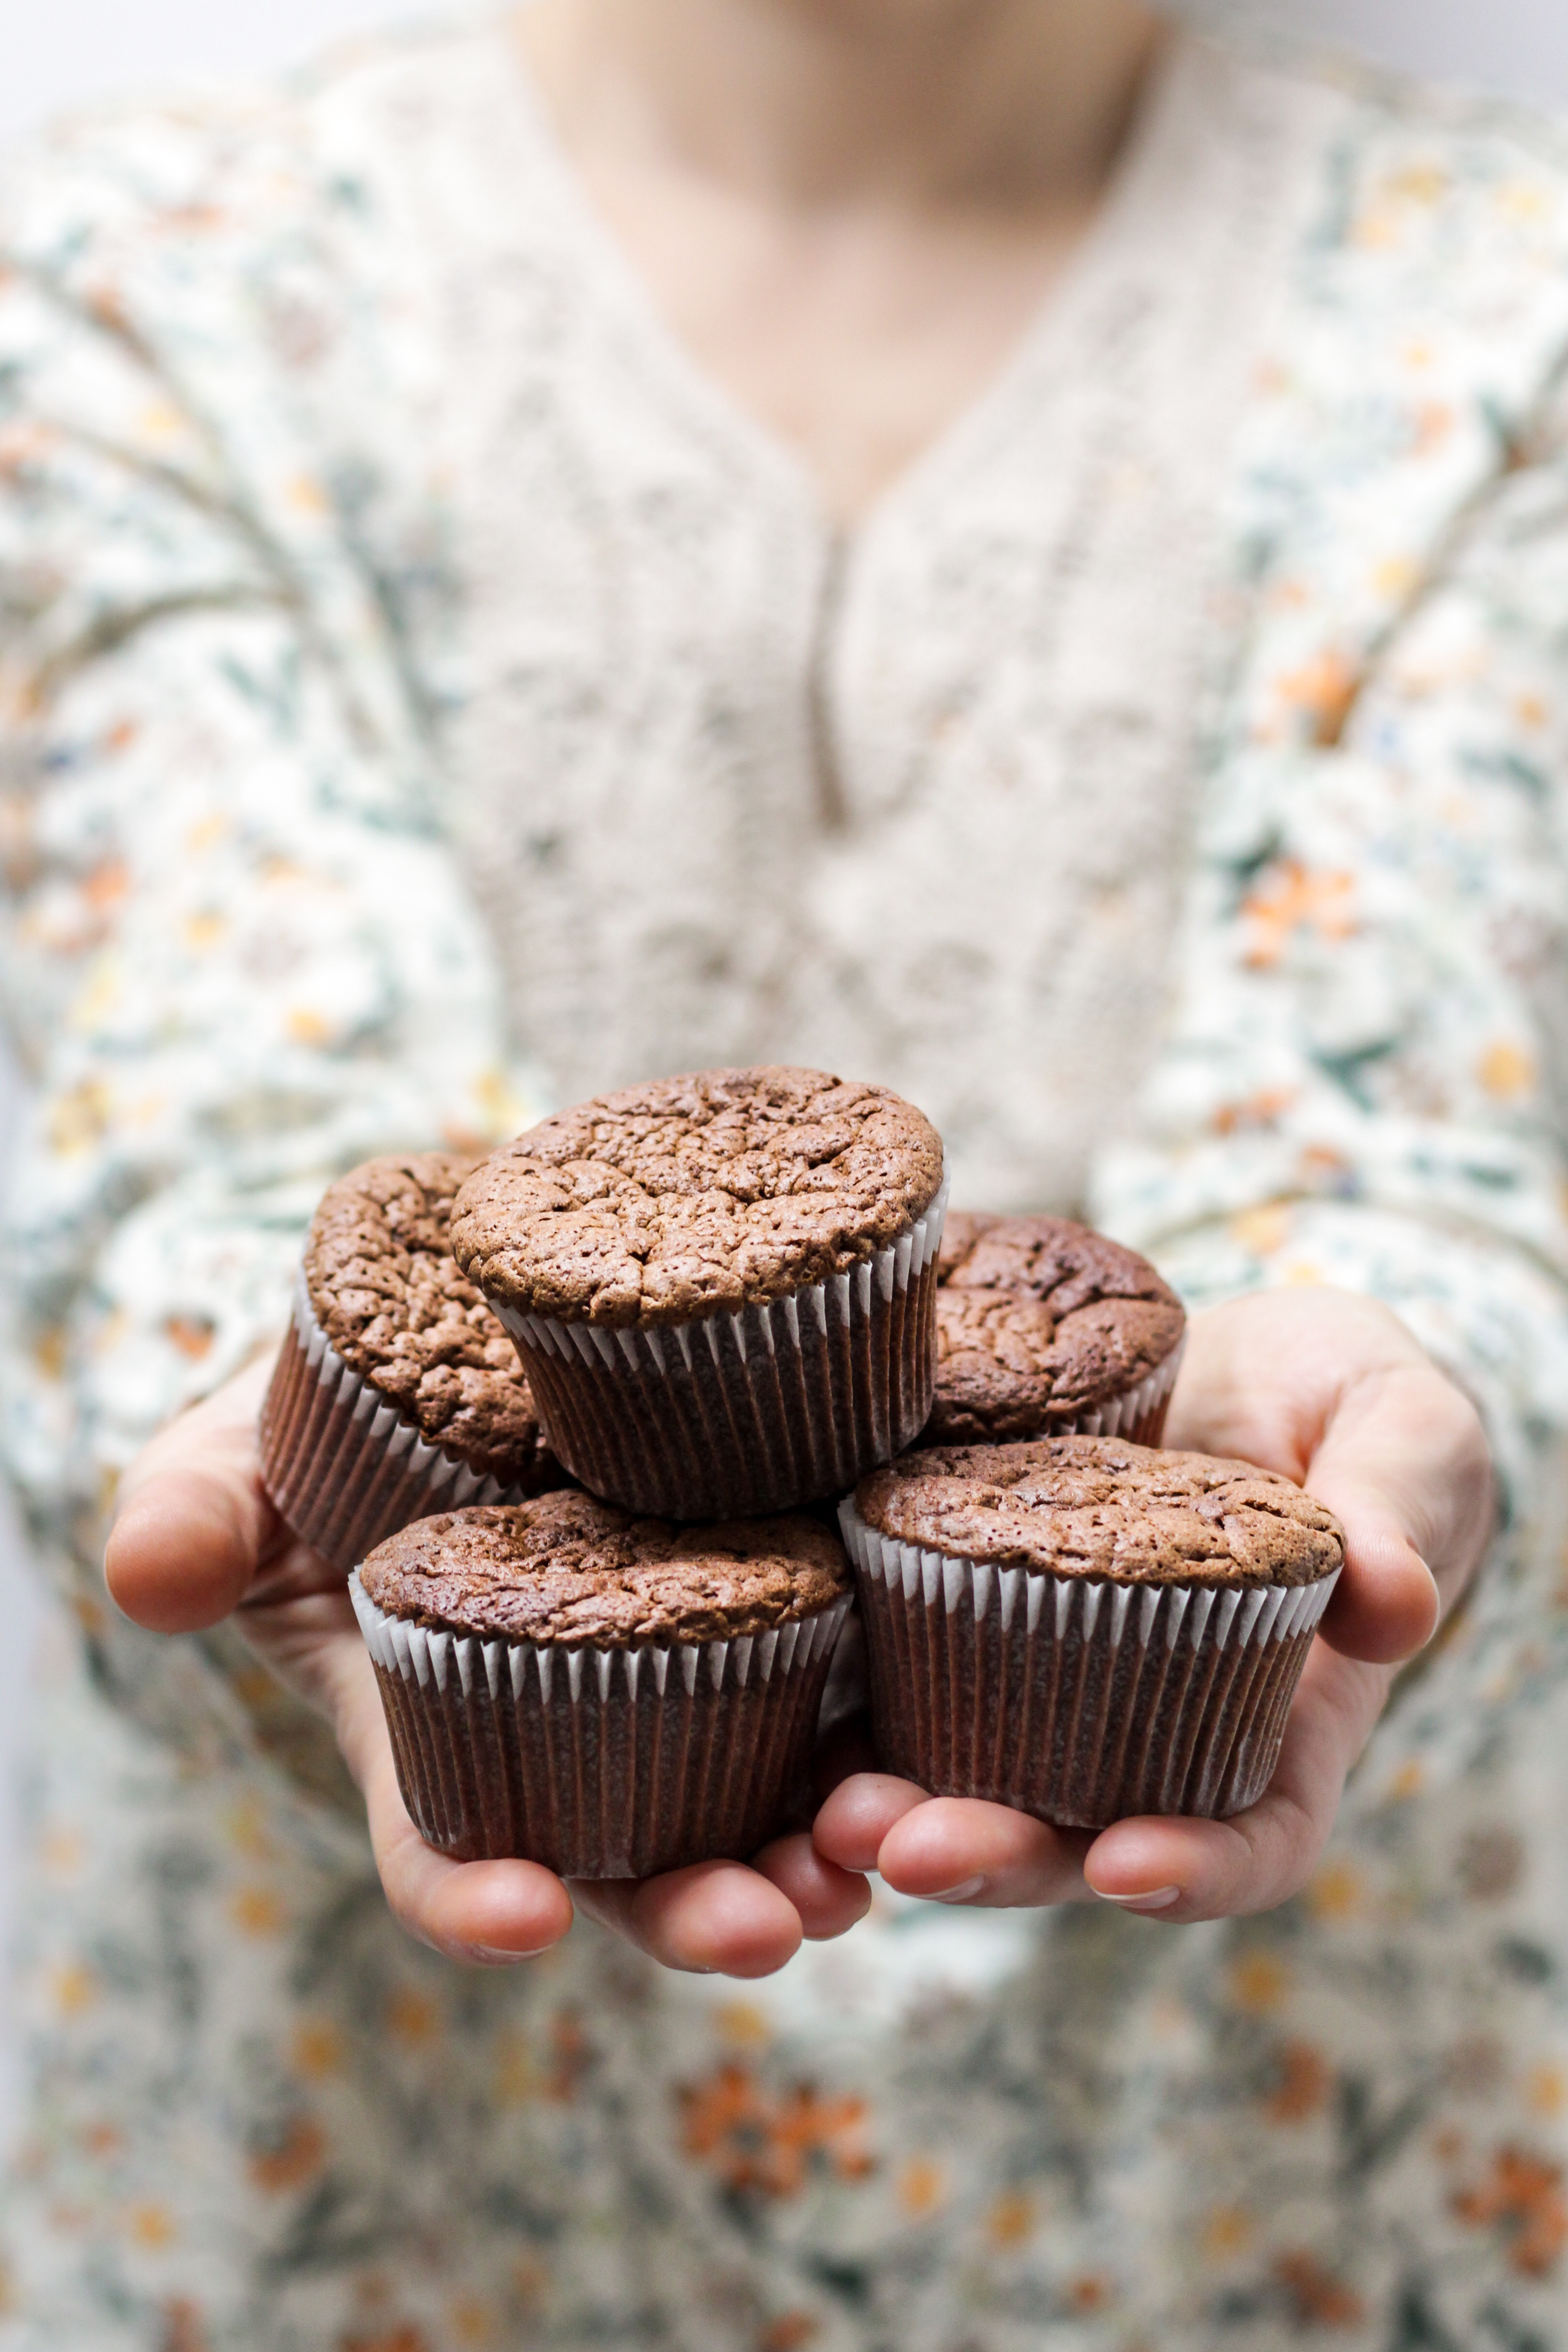 Cupcakes au chocolat© NordWood Themes